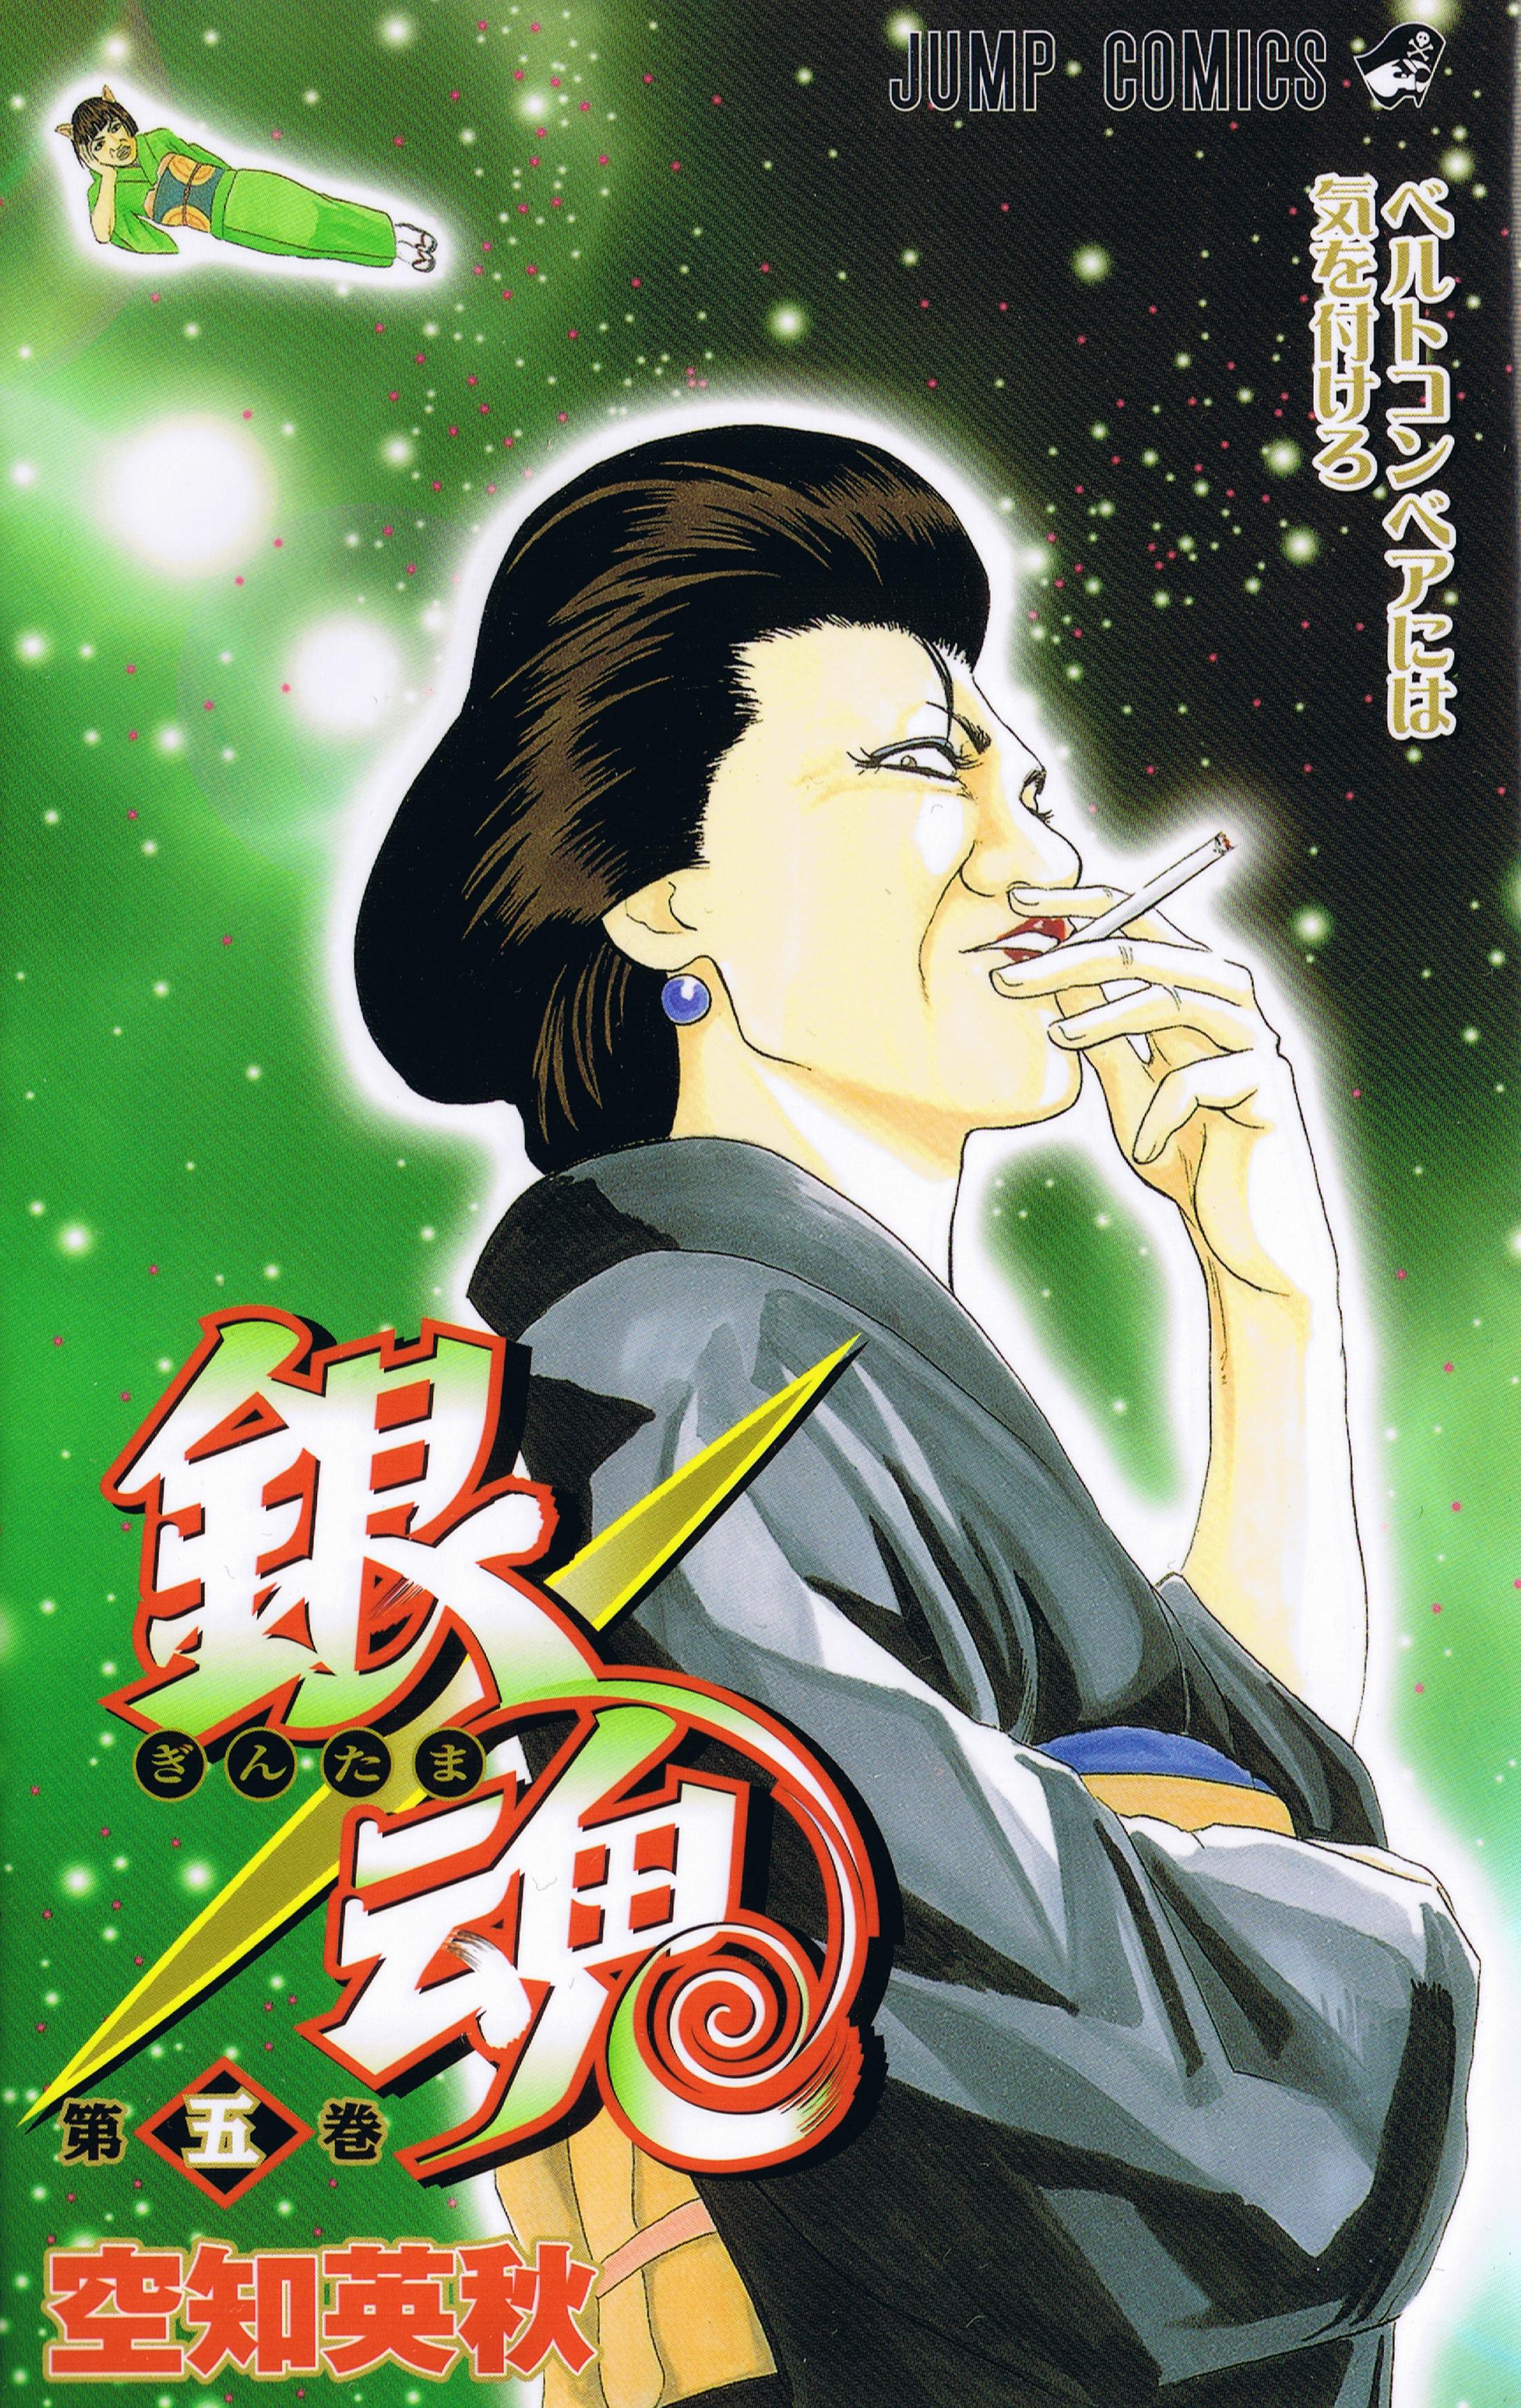 Gintama Otose Catherine Gintama Minitokyo